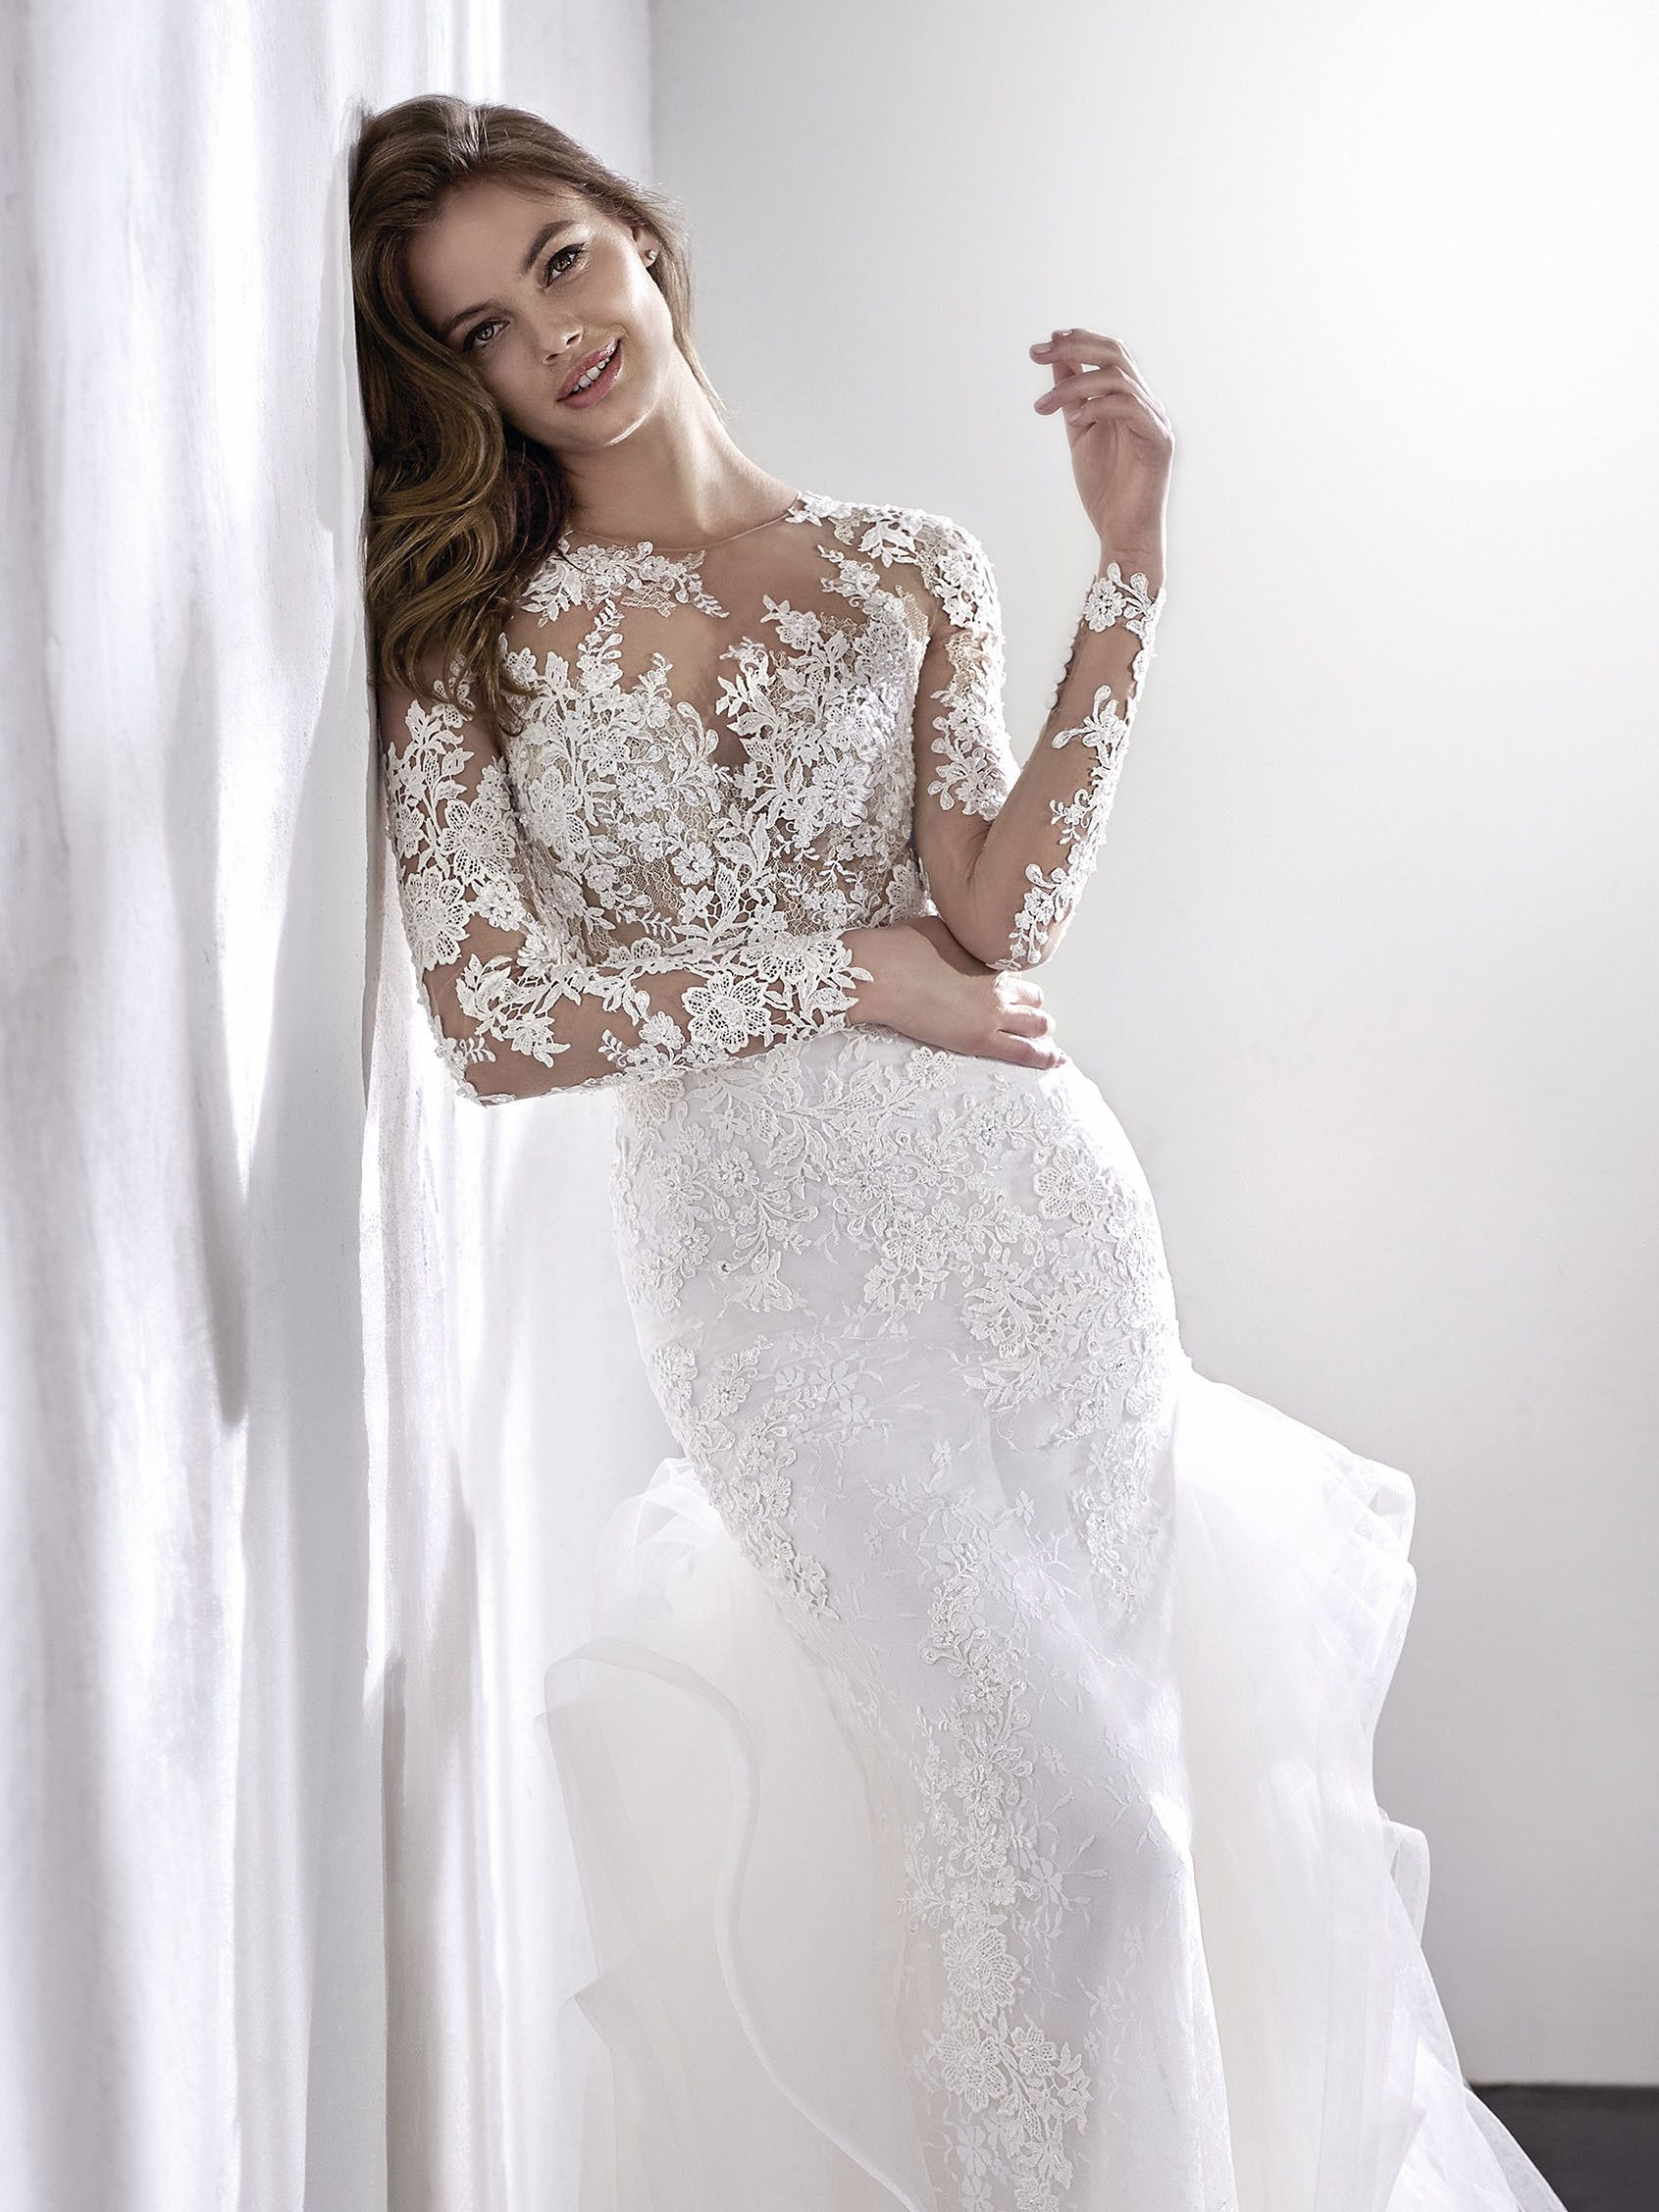 Wedding Dress Illusion Neckline Wedding Dress Accessories Pronovias Wedding Dress Wedding Dresses